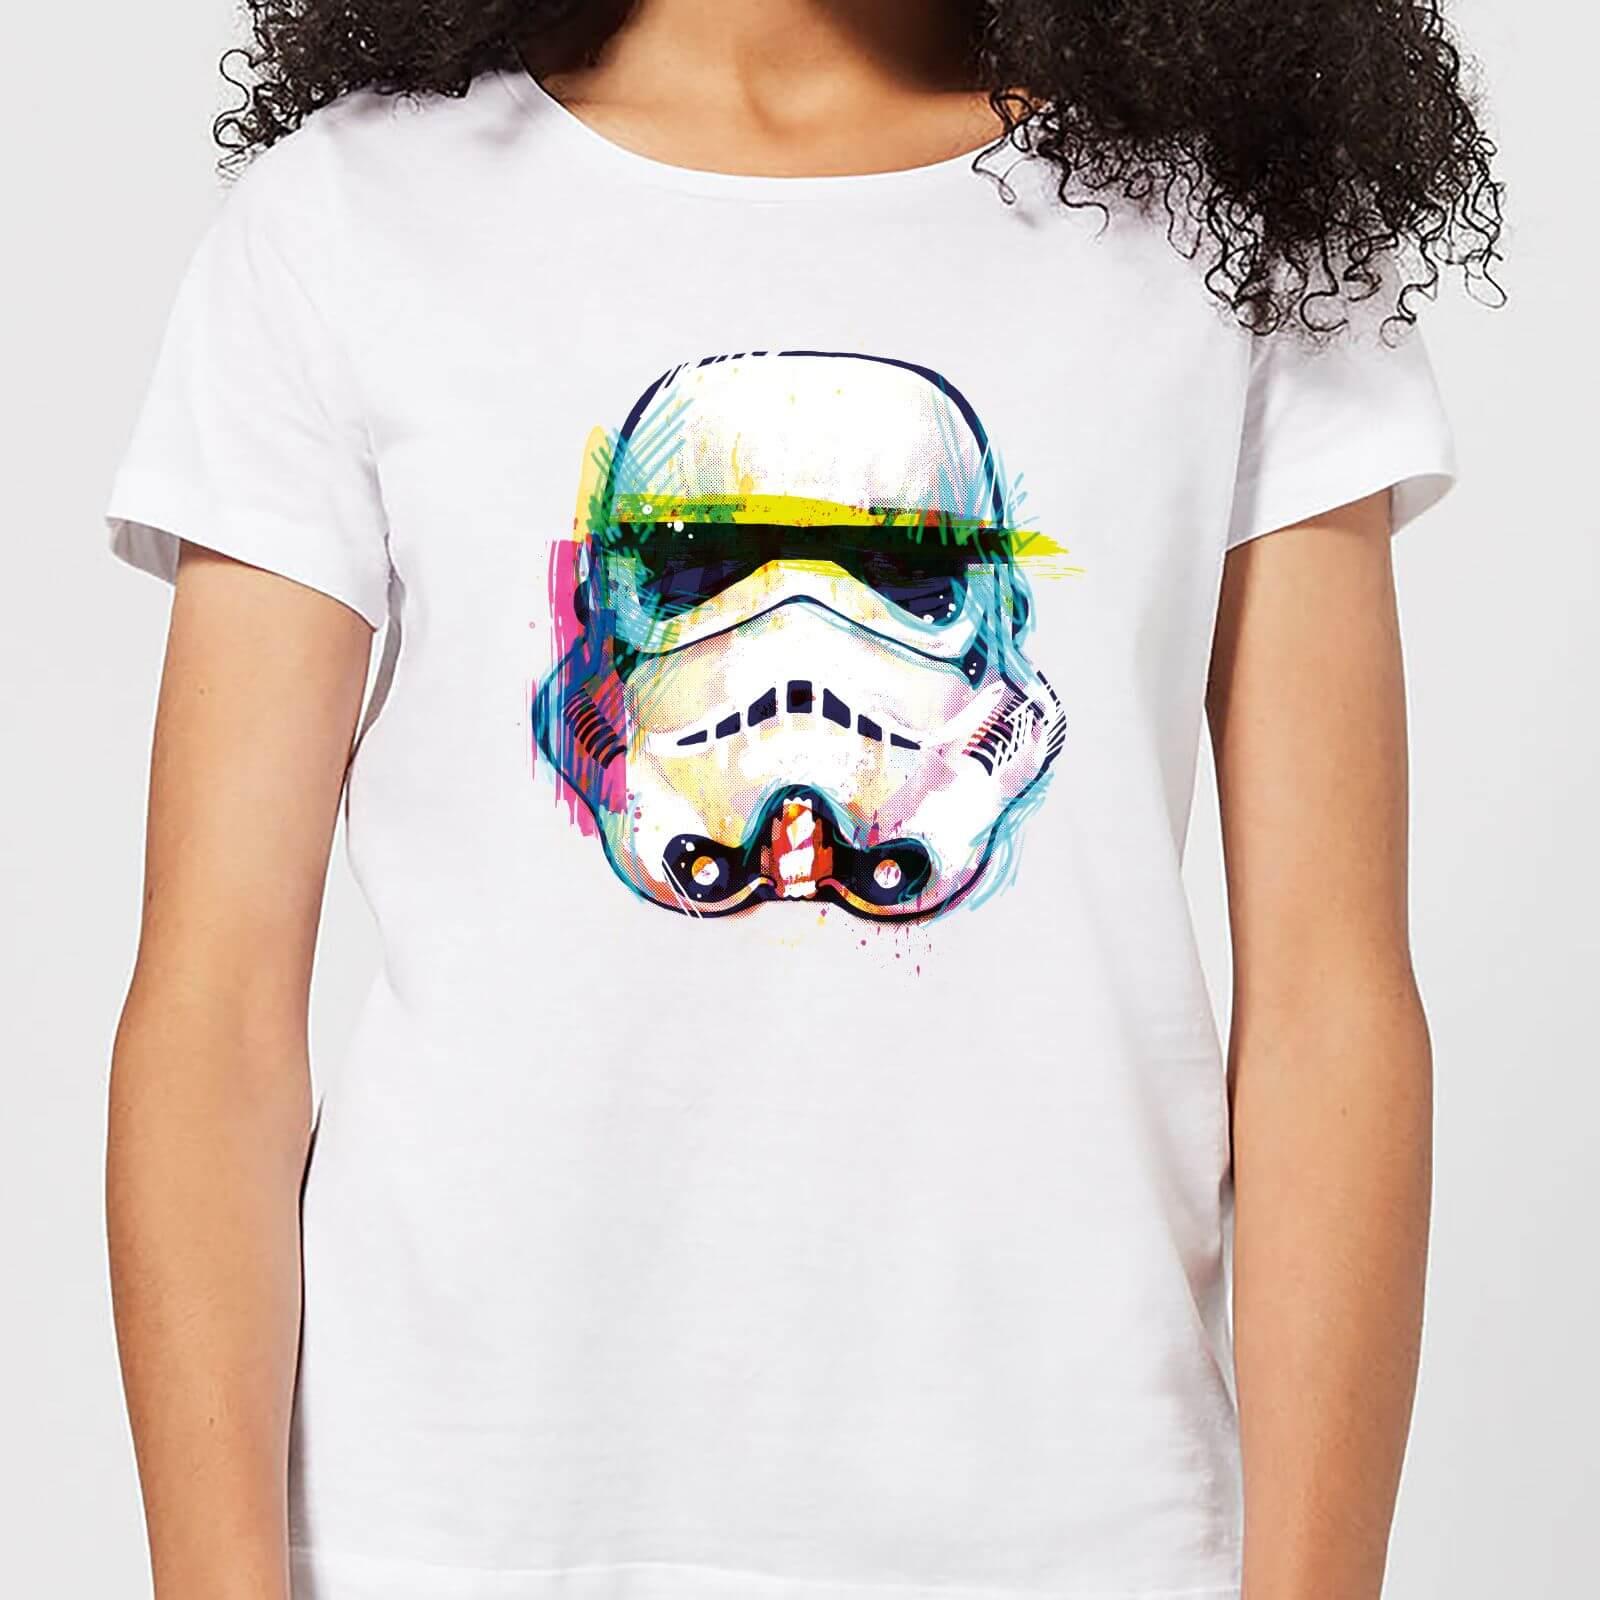 Star Wars Stormtrooper Paintbrush Women's T-Shirt - White - S - White